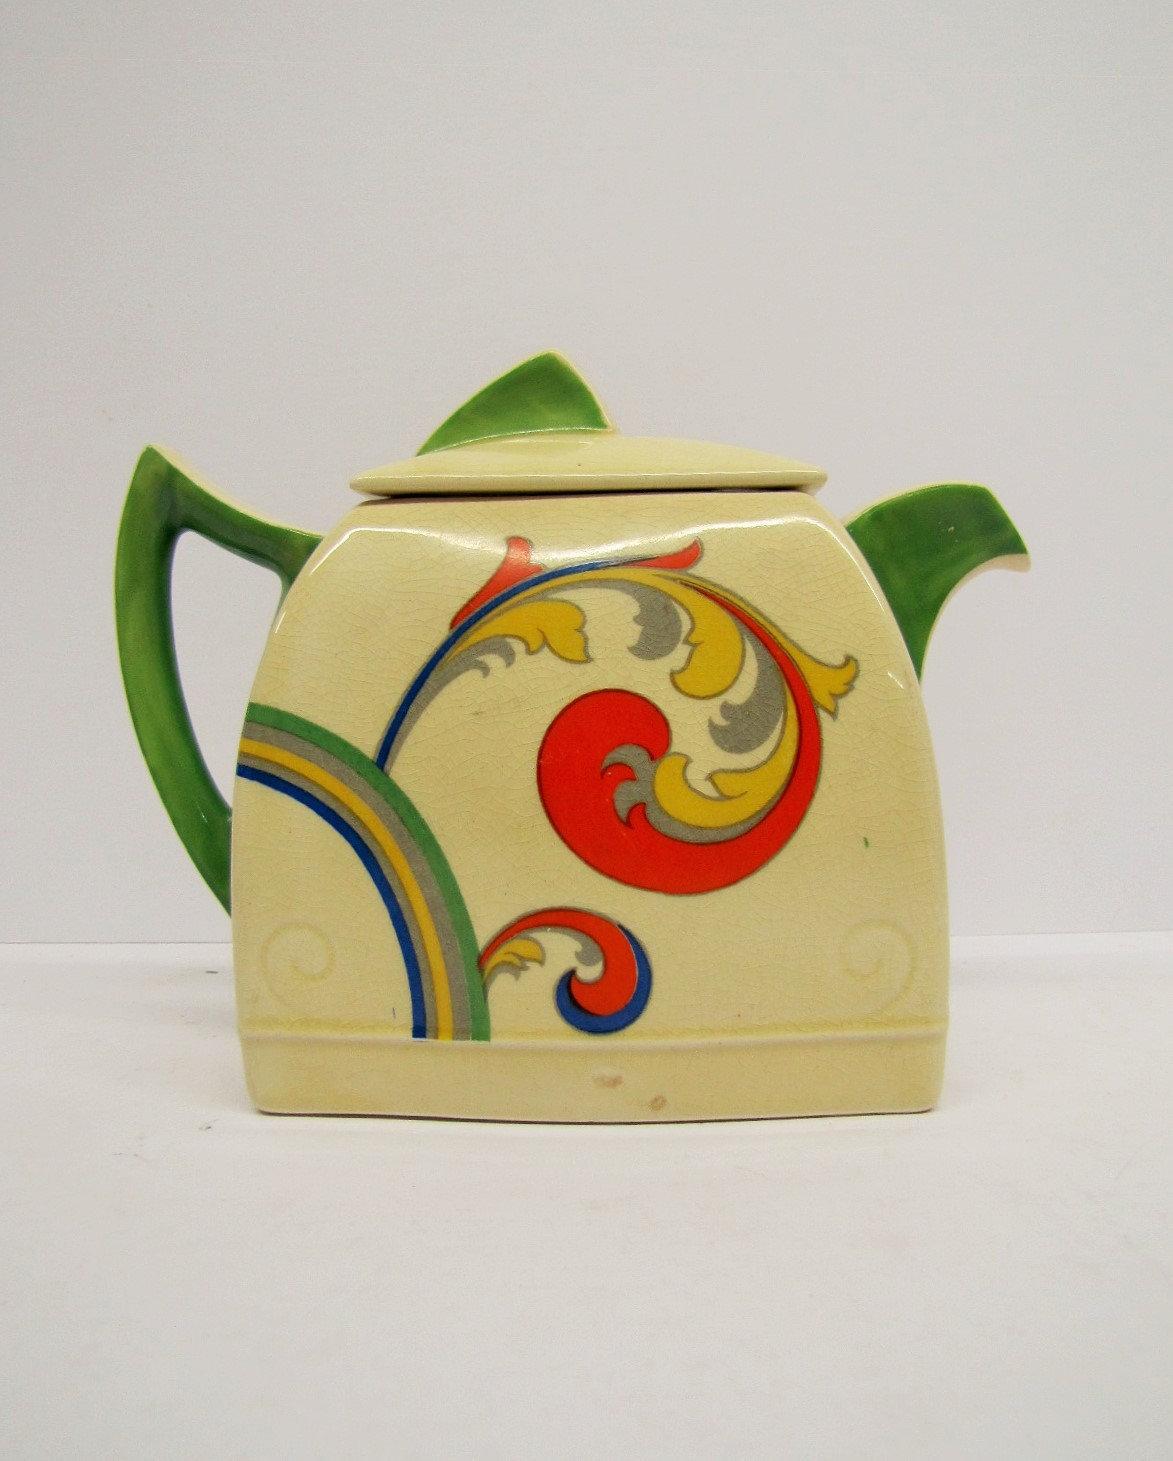 Royal Doulton Syren Teapot, Rare Art Deco Syren Duveen Design Tea Pot,  Pattern D5102 Art Deco Teapot, Burslem, England